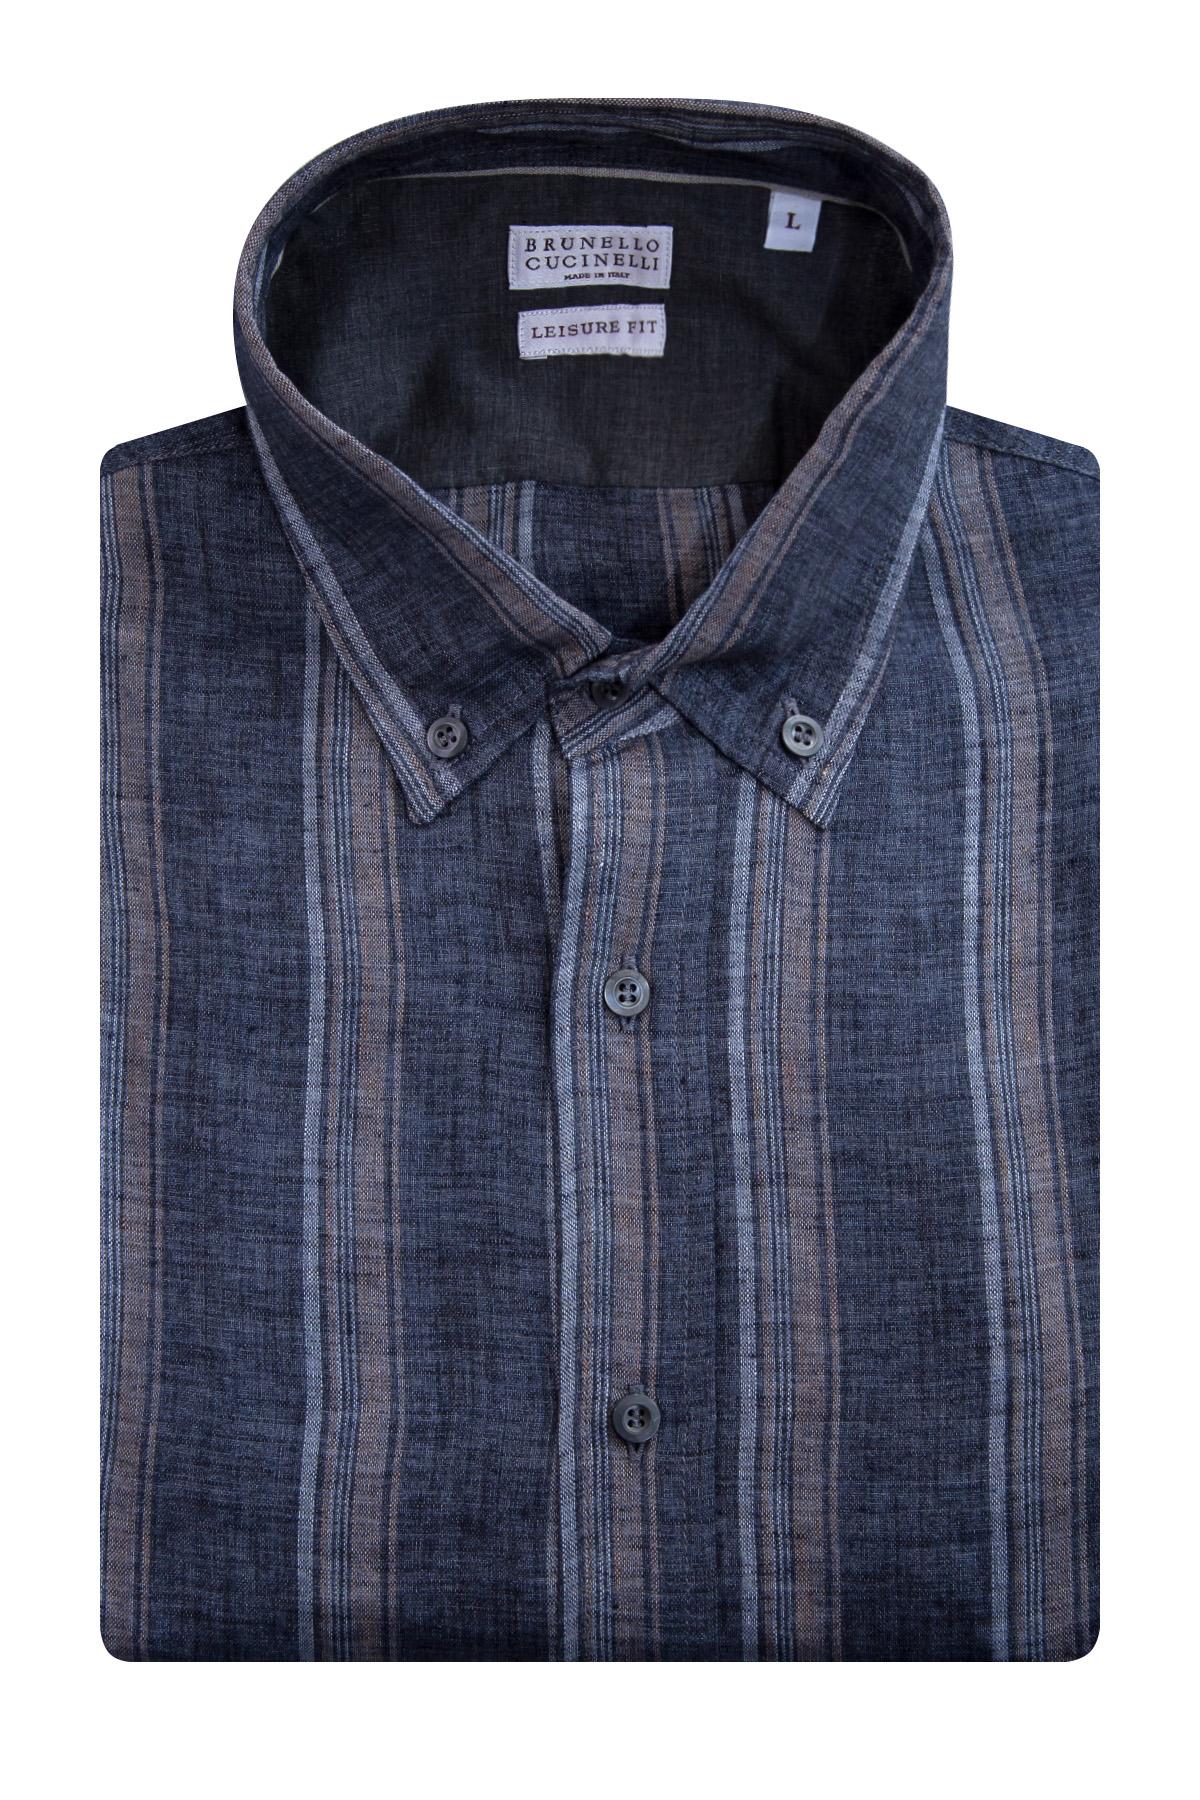 Купить Рубашка из льняного джерси с рисунком bande, BRUNELLO CUCINELLI, Италия, лен 100%